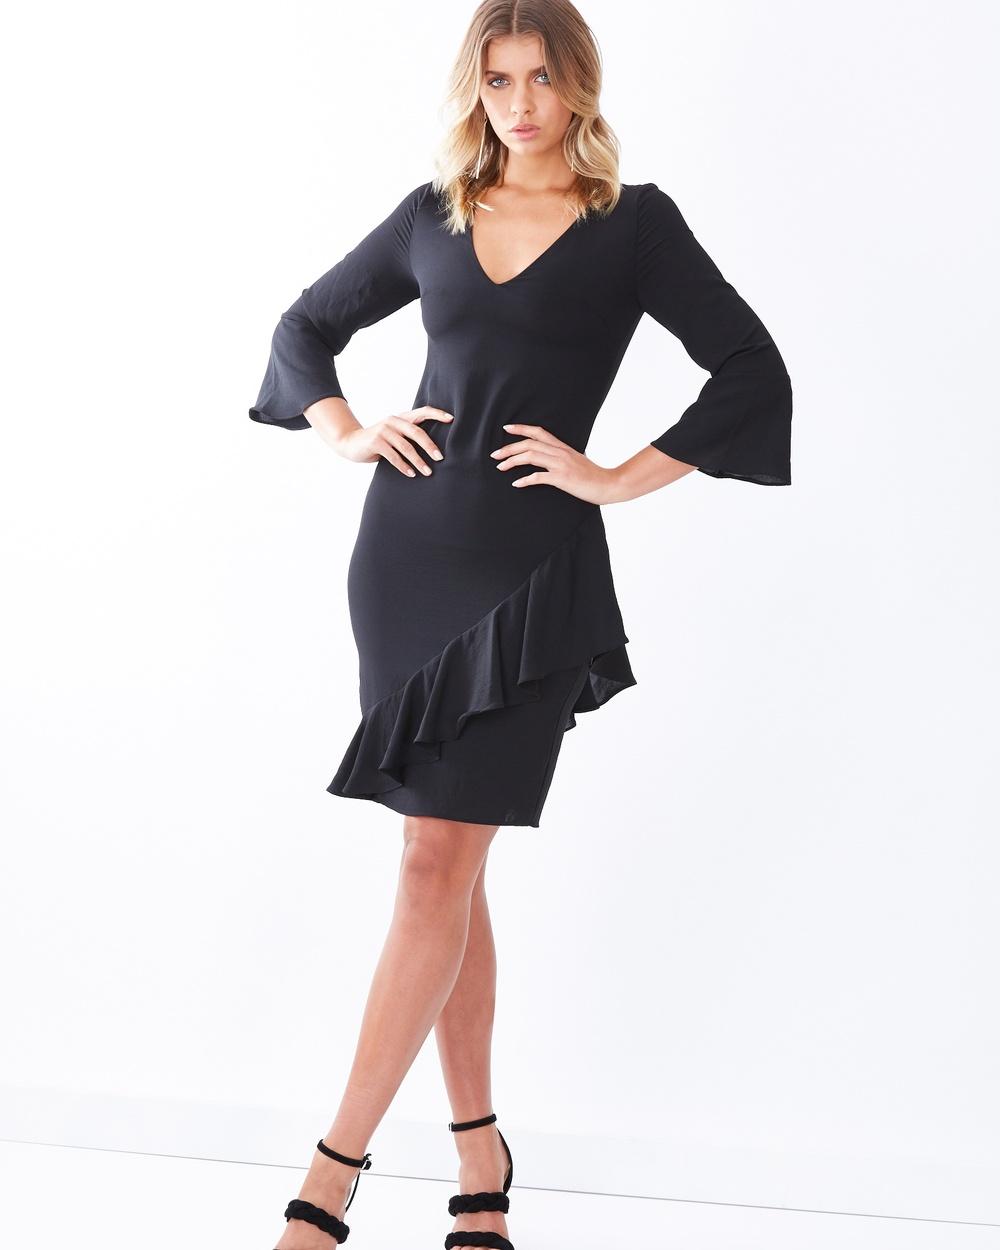 Tussah Varna Dress Dresses Black Varna Dress